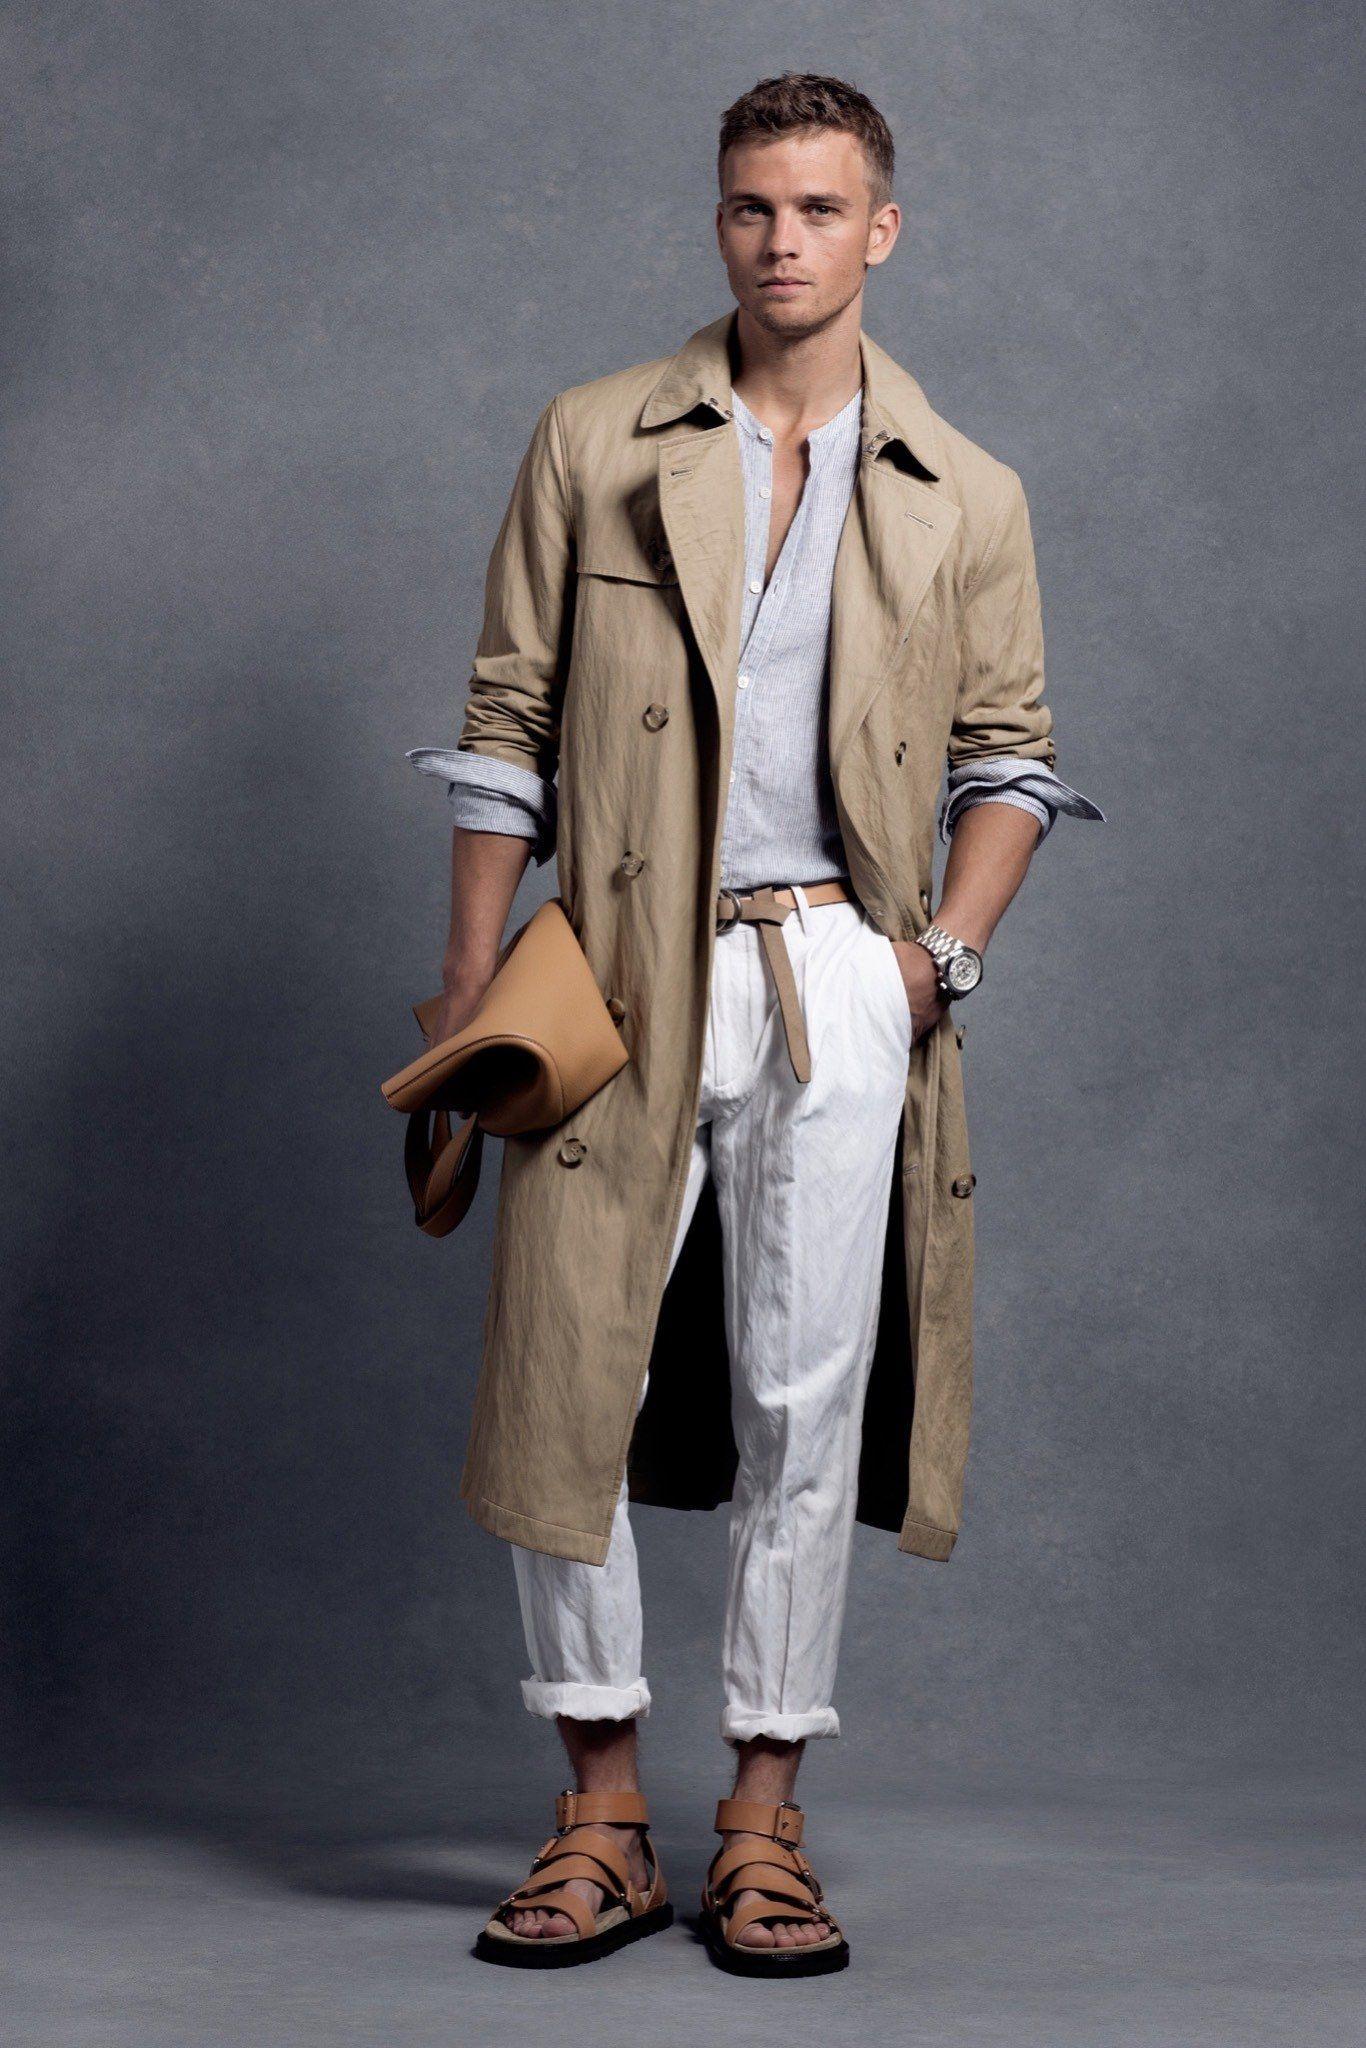 Michael Kors Menswear: AW14 Collection photo